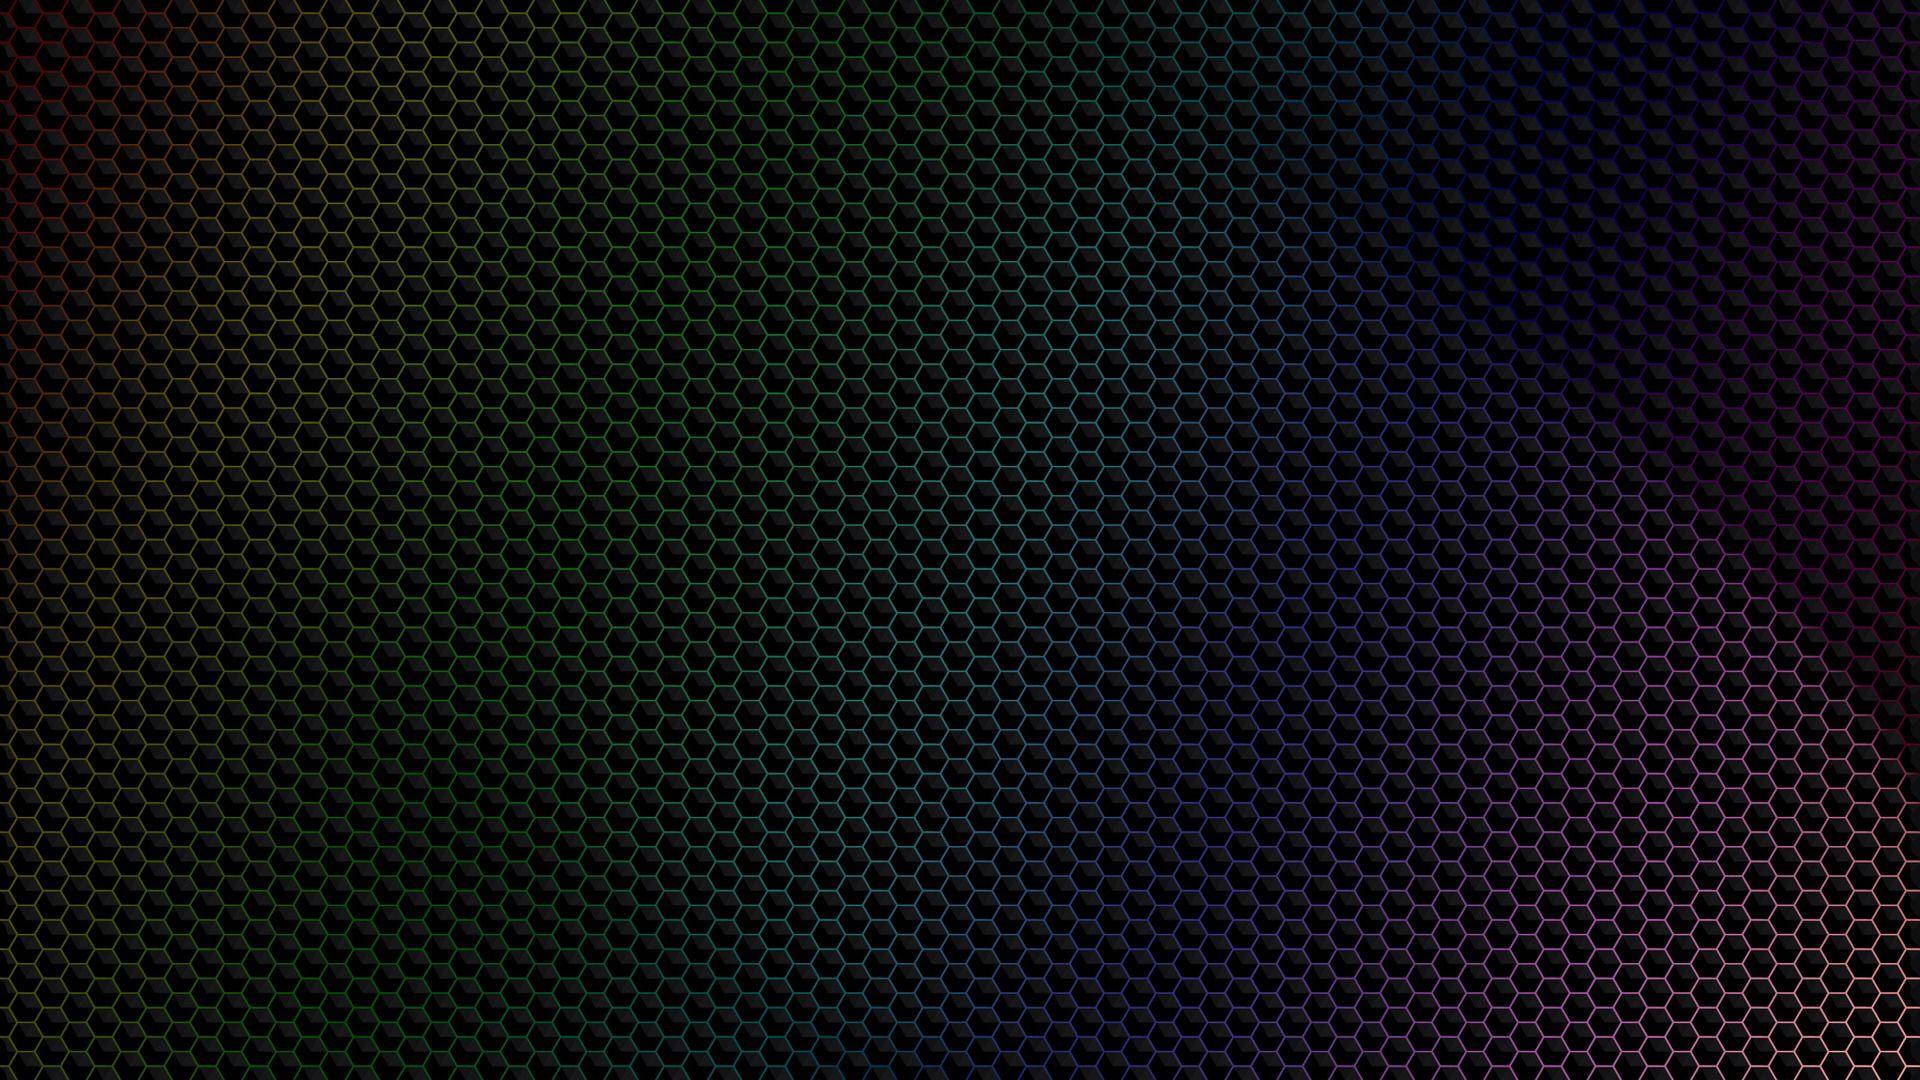 Carbon Fiber Background Picture Image 1920x1080